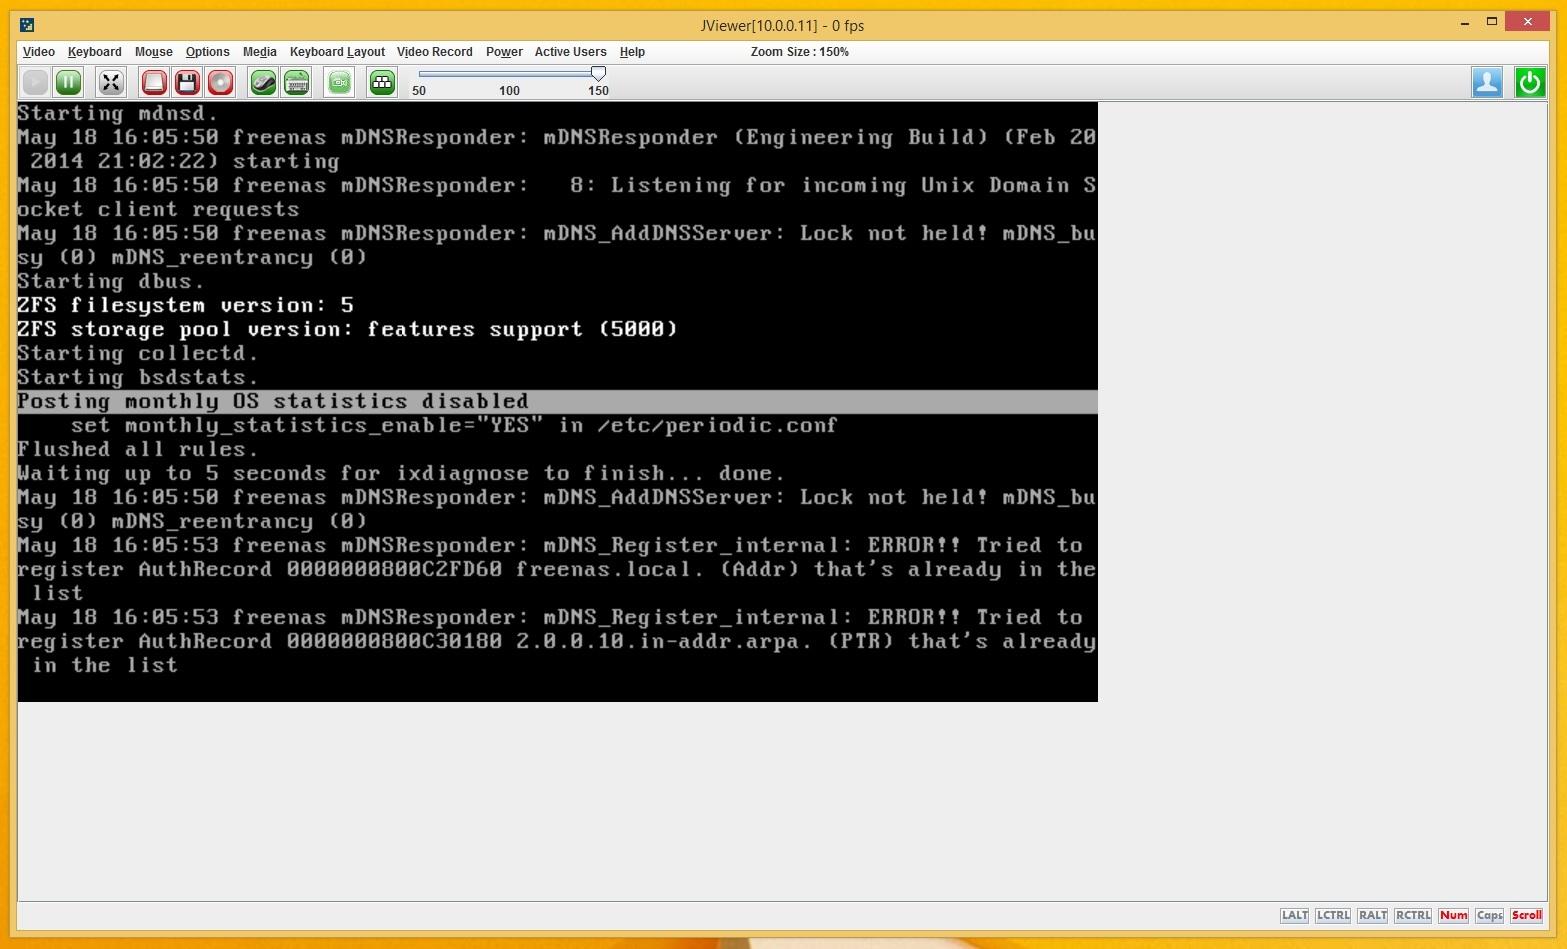 Installation Error - won't Boot | iXsystems Community